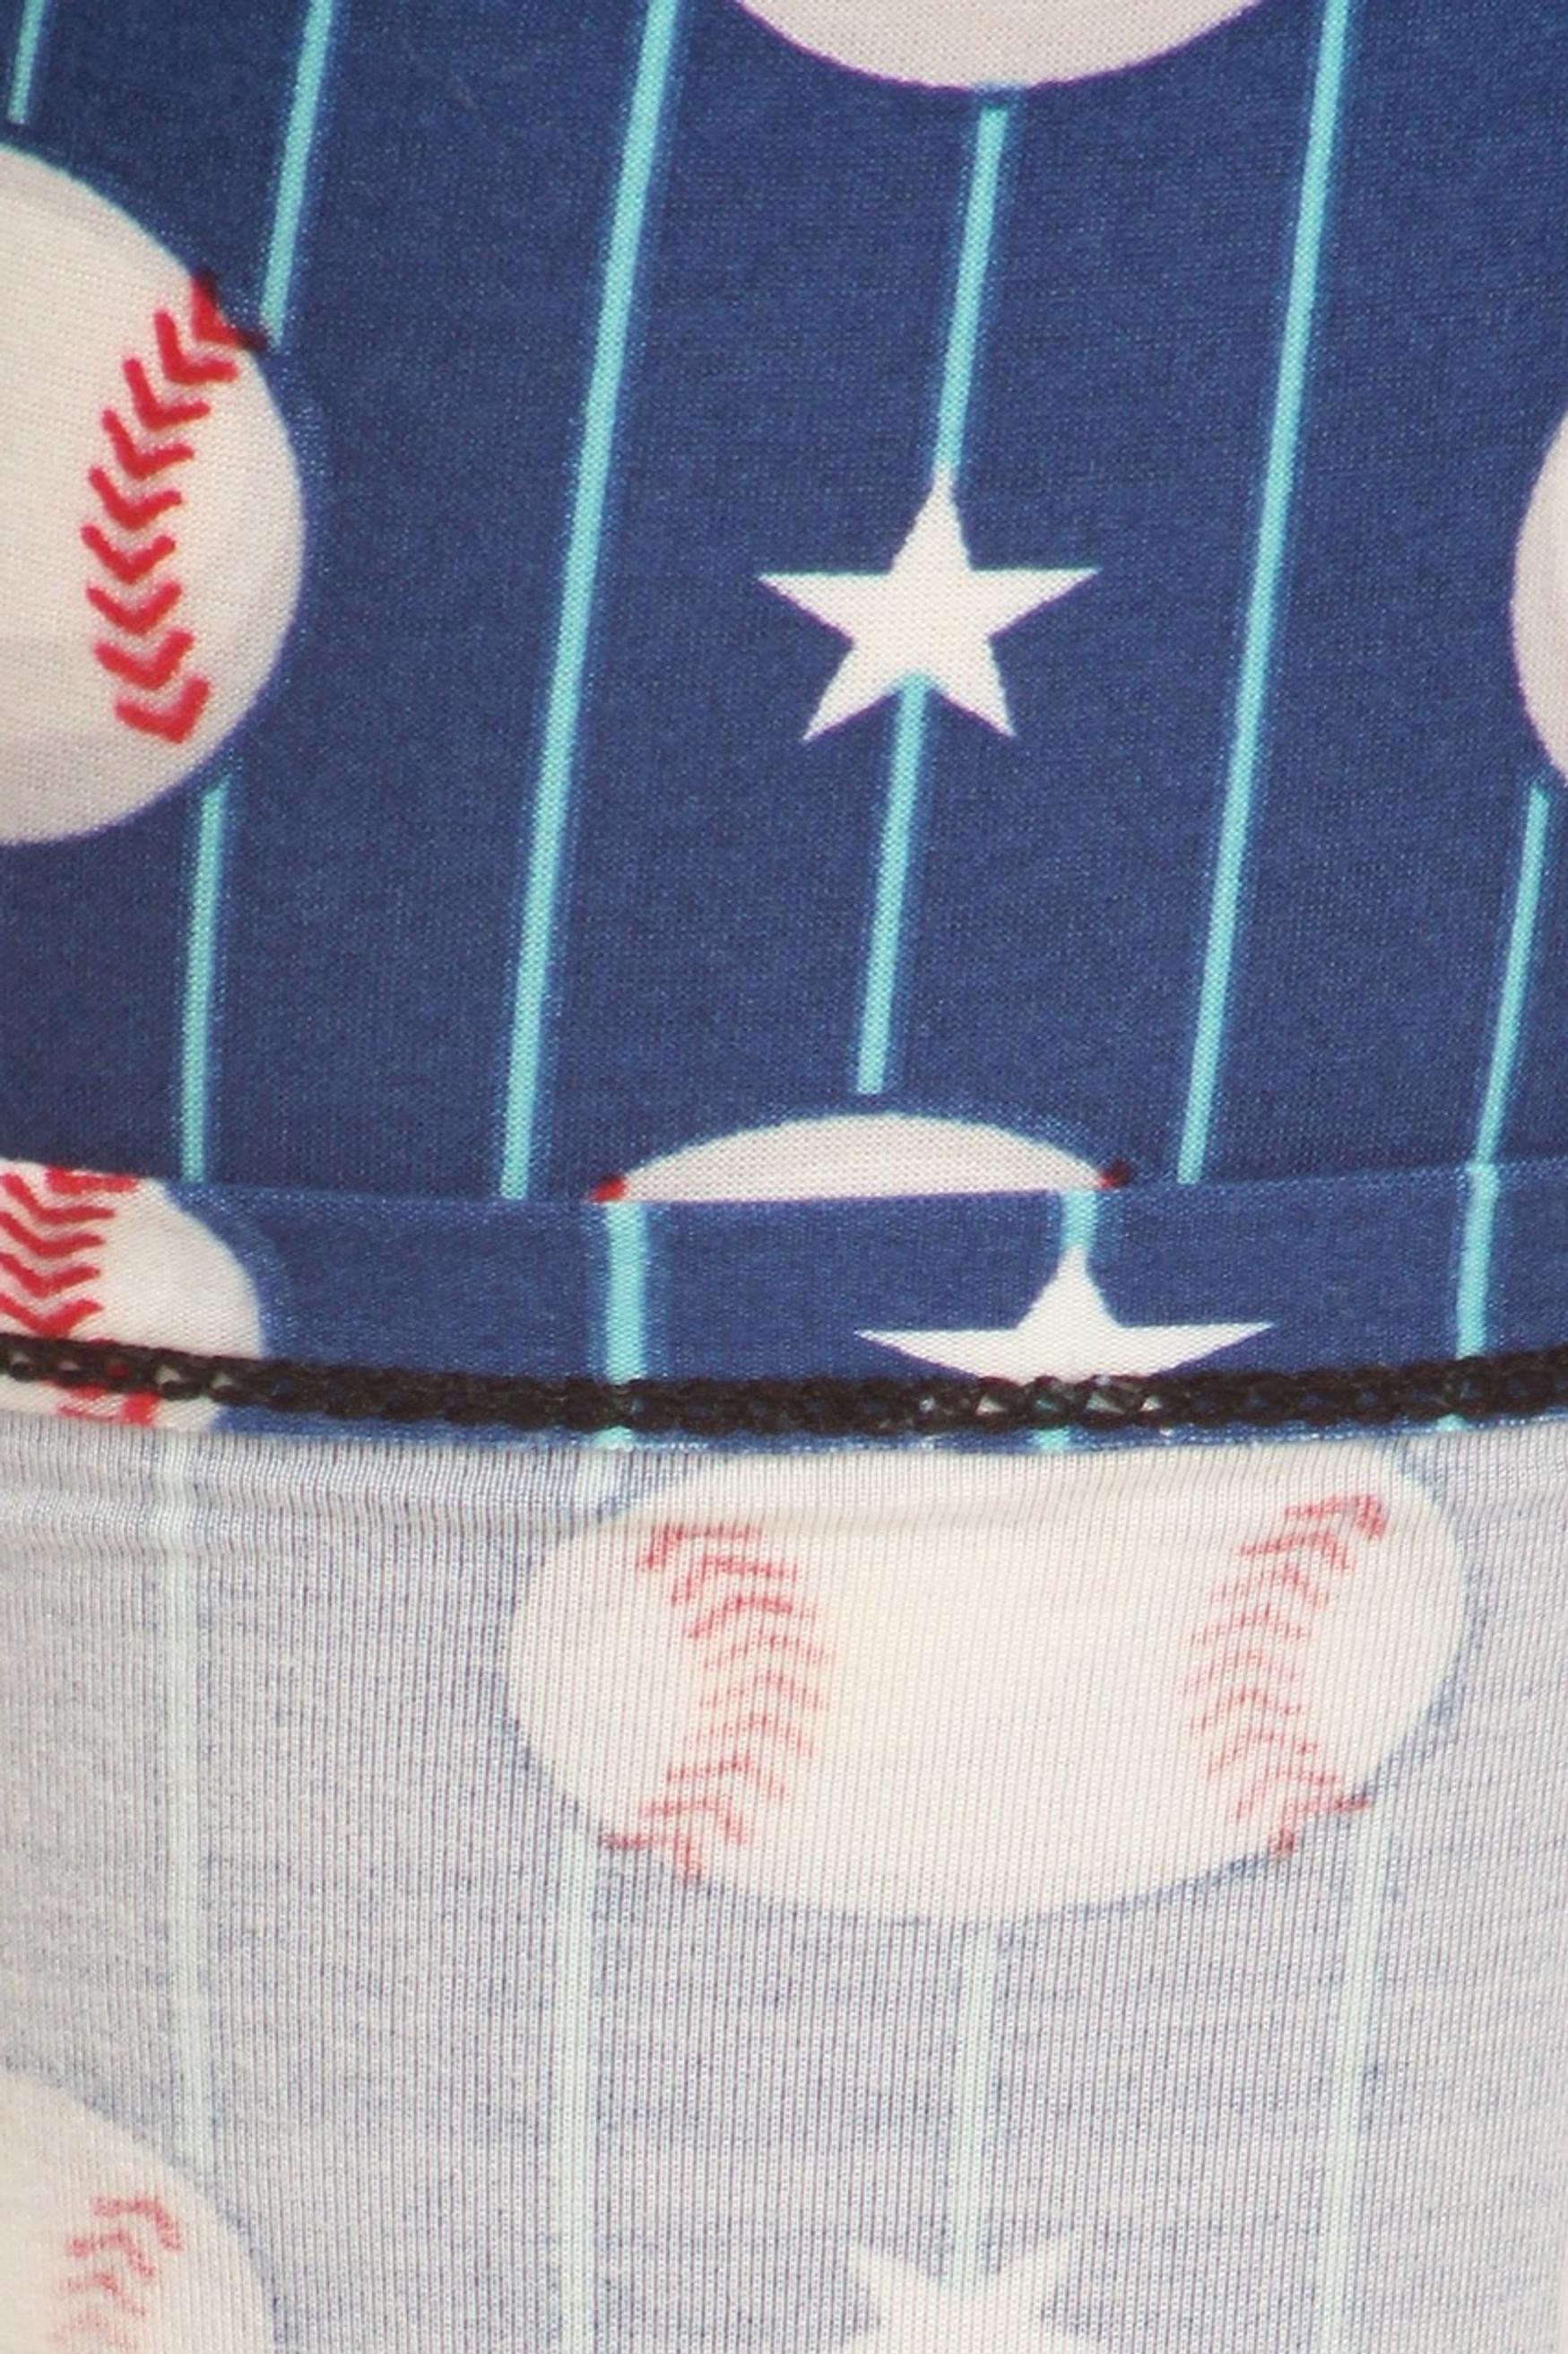 Baseball Plus Size Leggings - 3X-5X